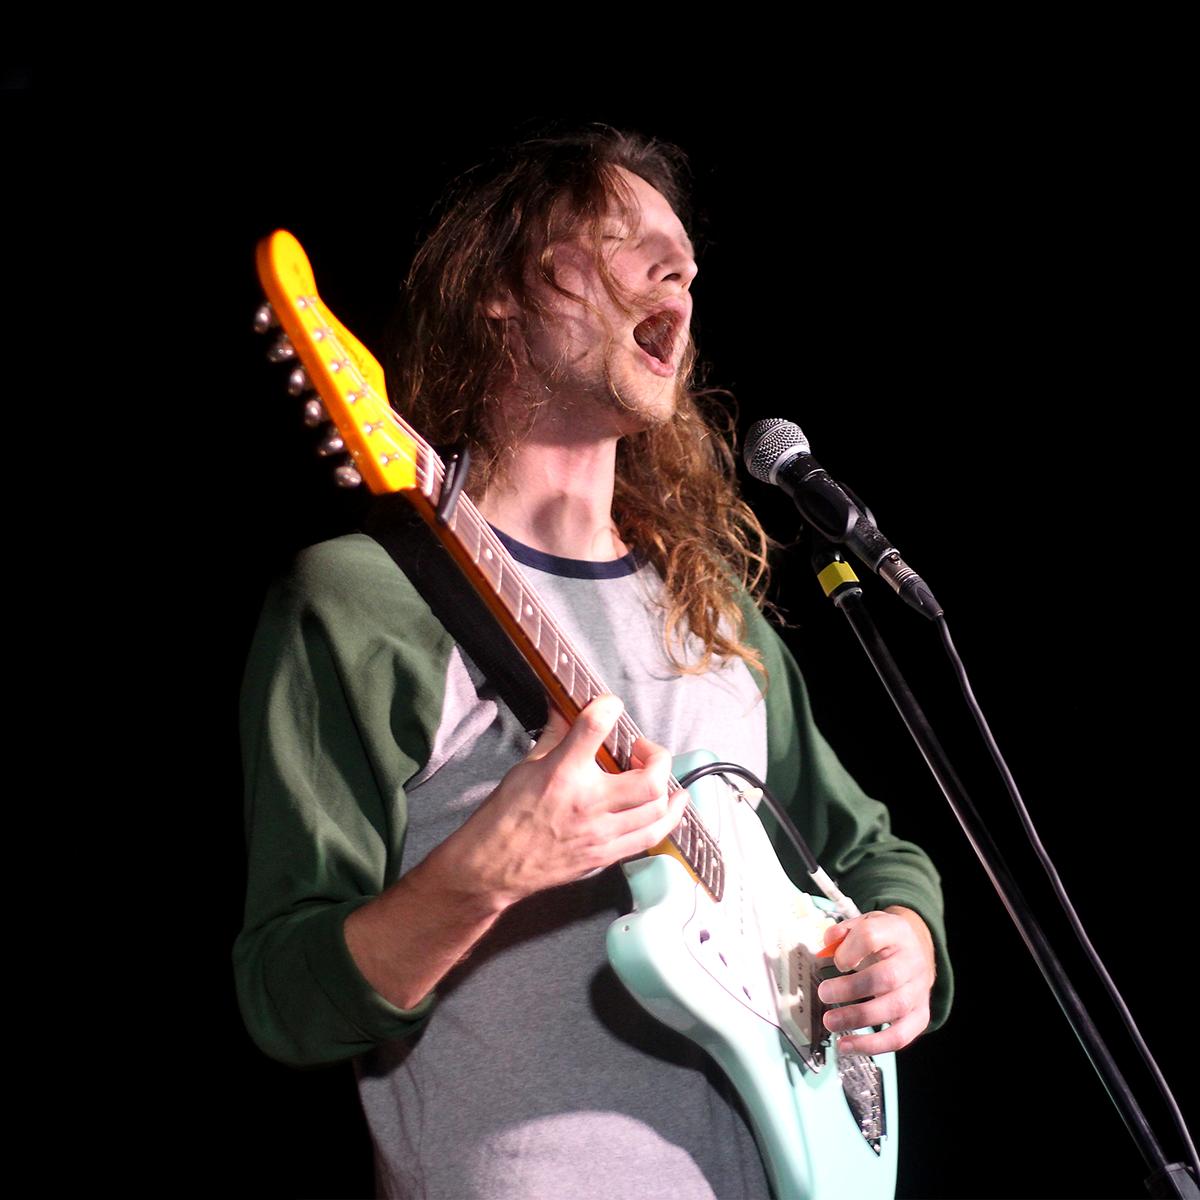 Banfi playing Latest Music Bar in Brighton on 21.02.16